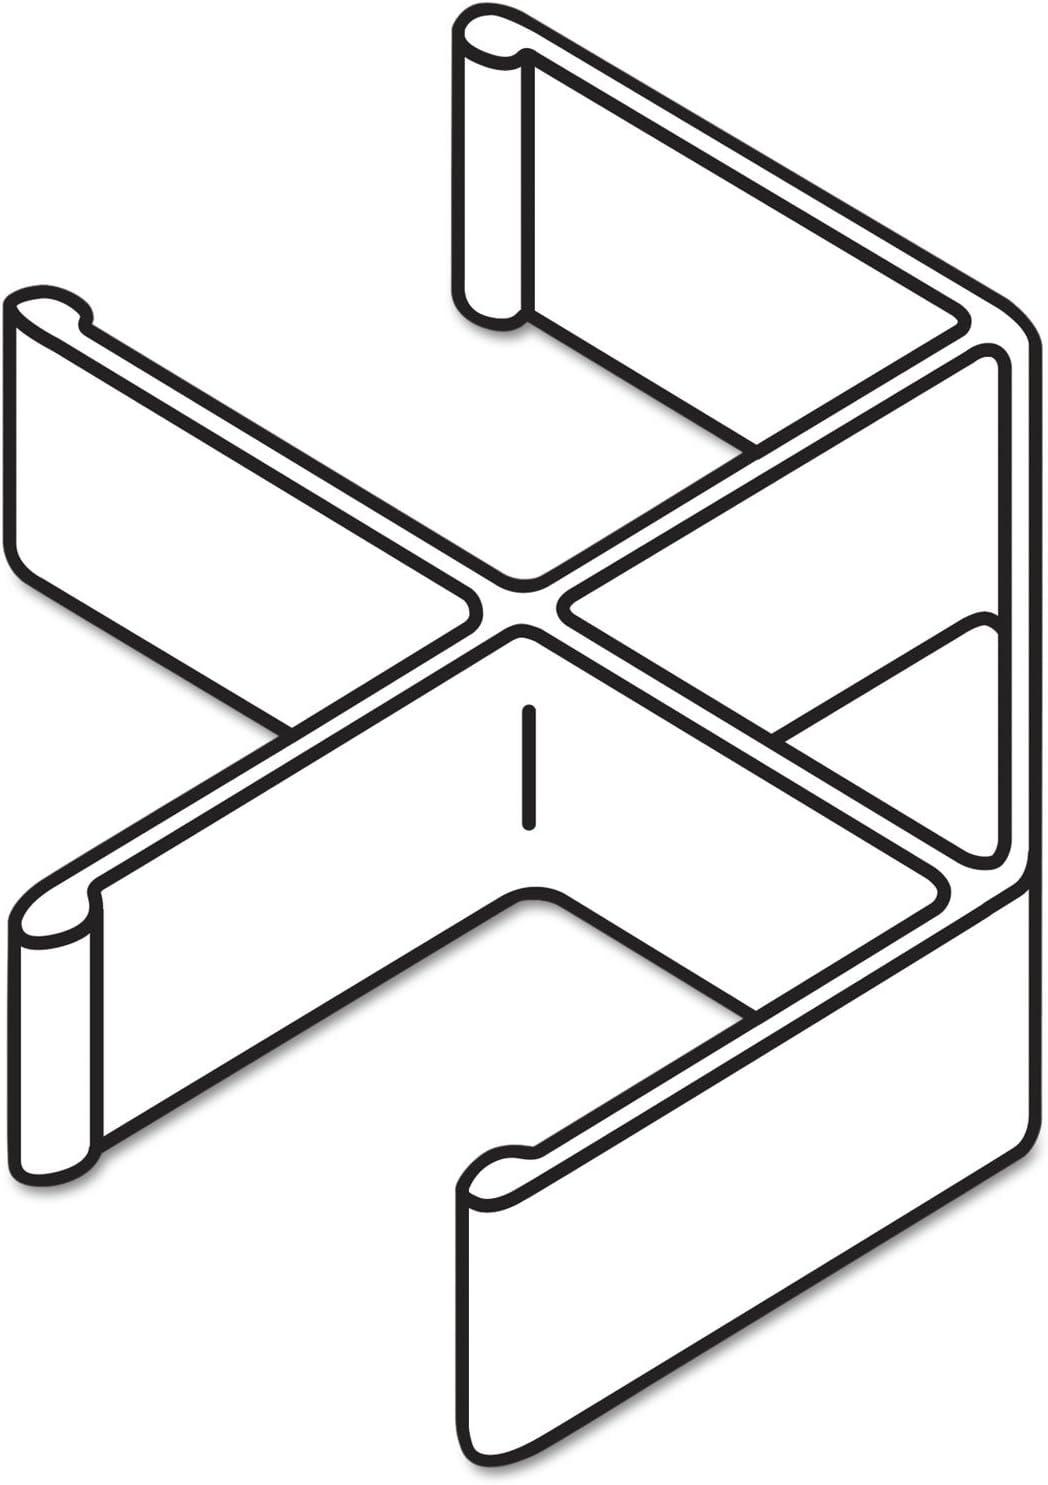 Pack of 2 TM Verse TM Maxon 90degree Connectors